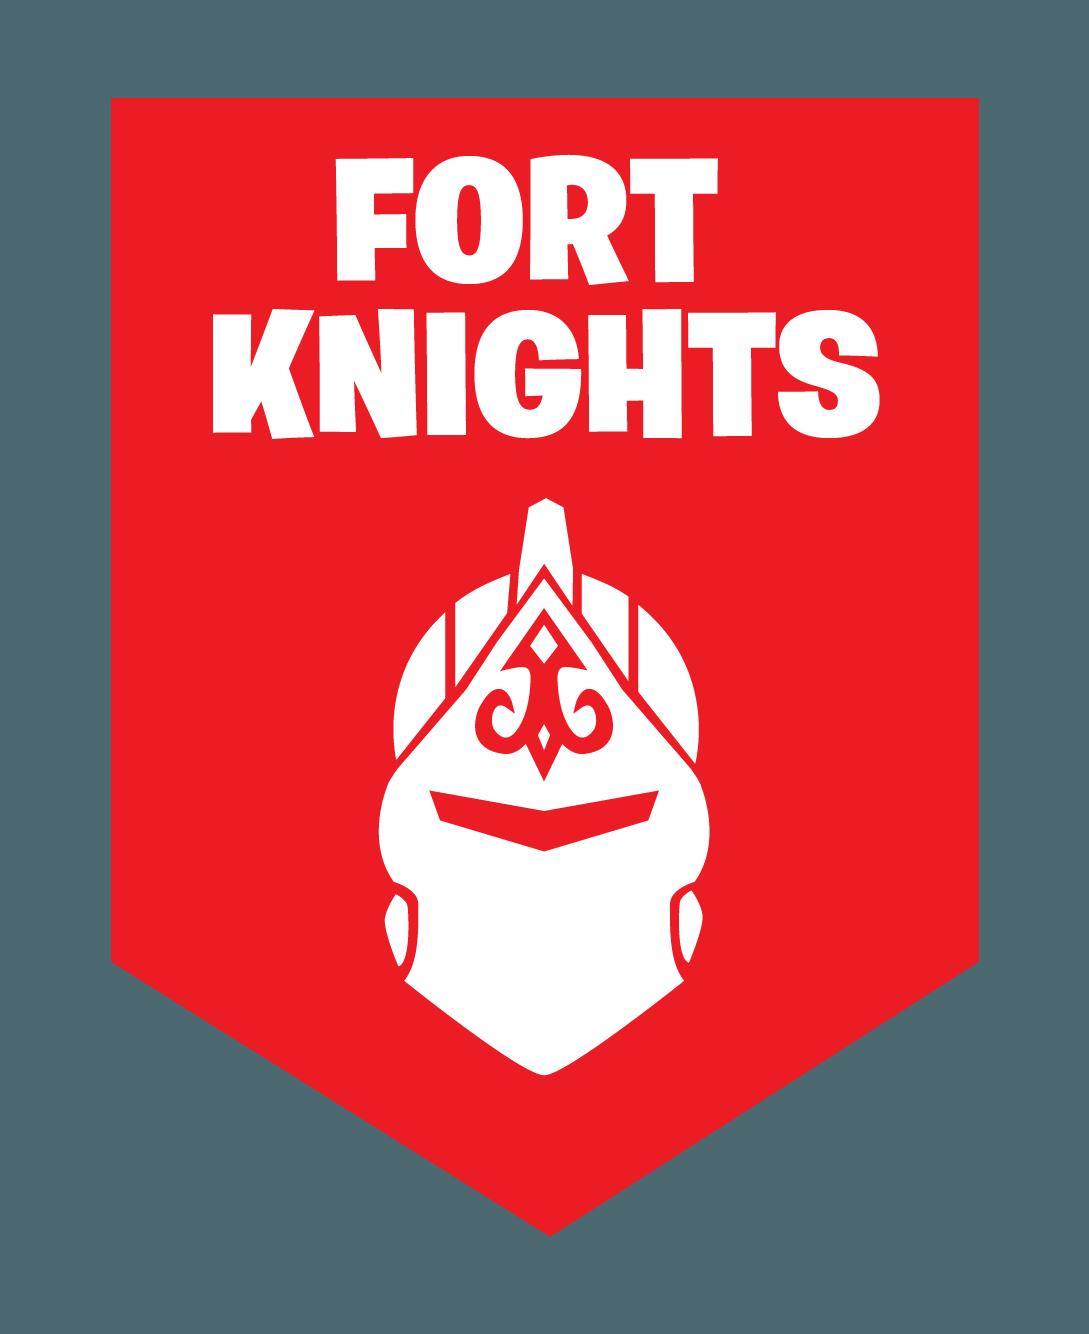 Fortnite Fall Skirmish detailed, 78 3 million players served